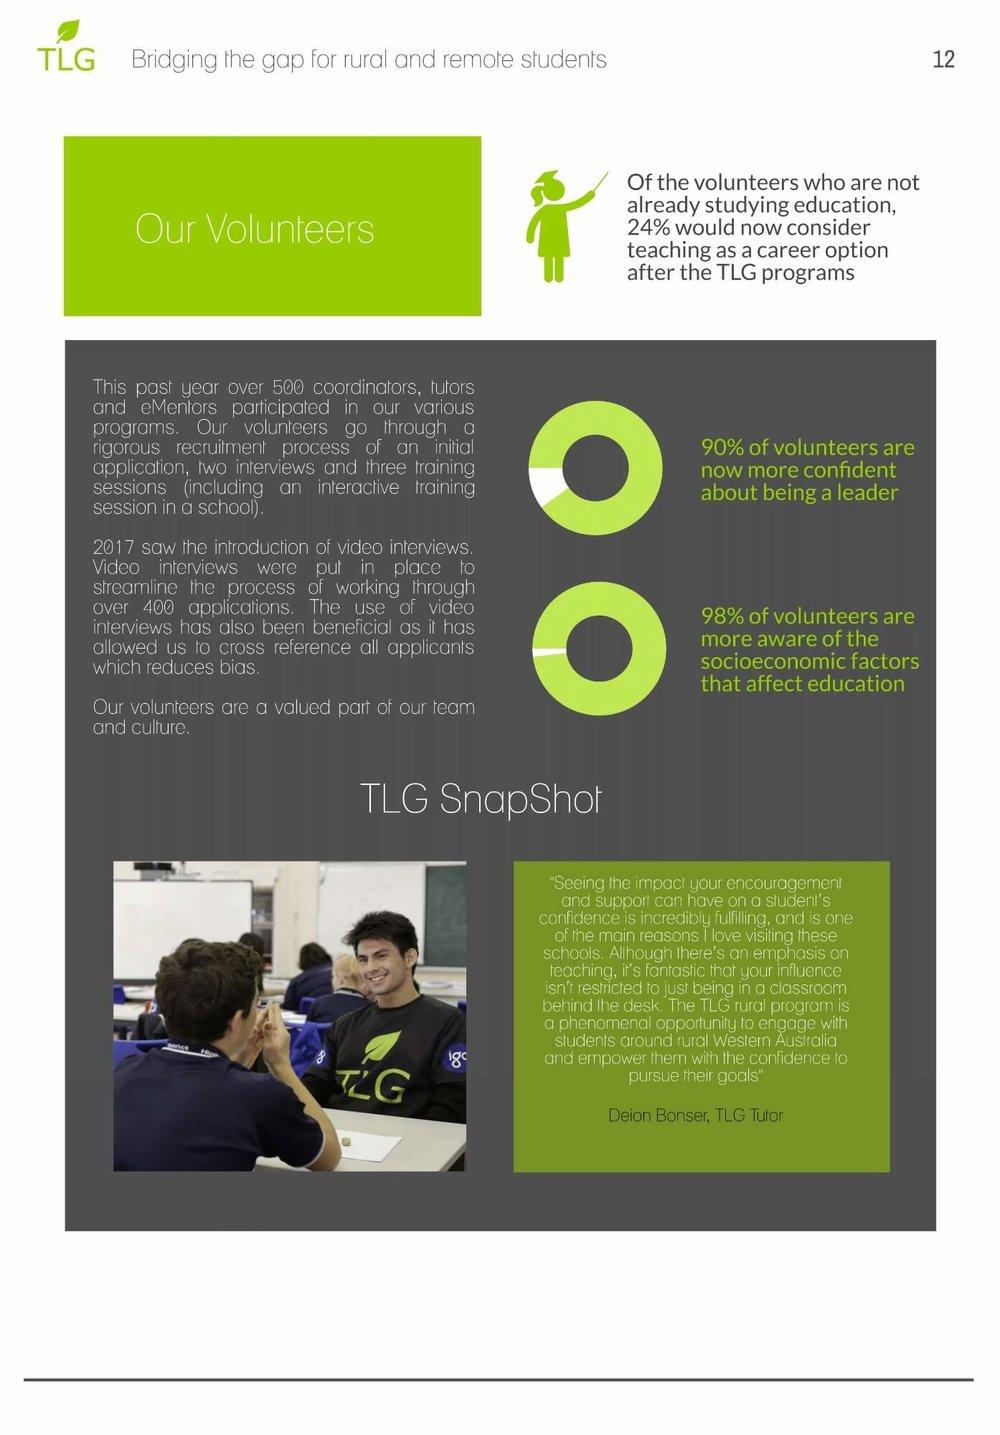 tlg-annual-report-FY16-12.jpg